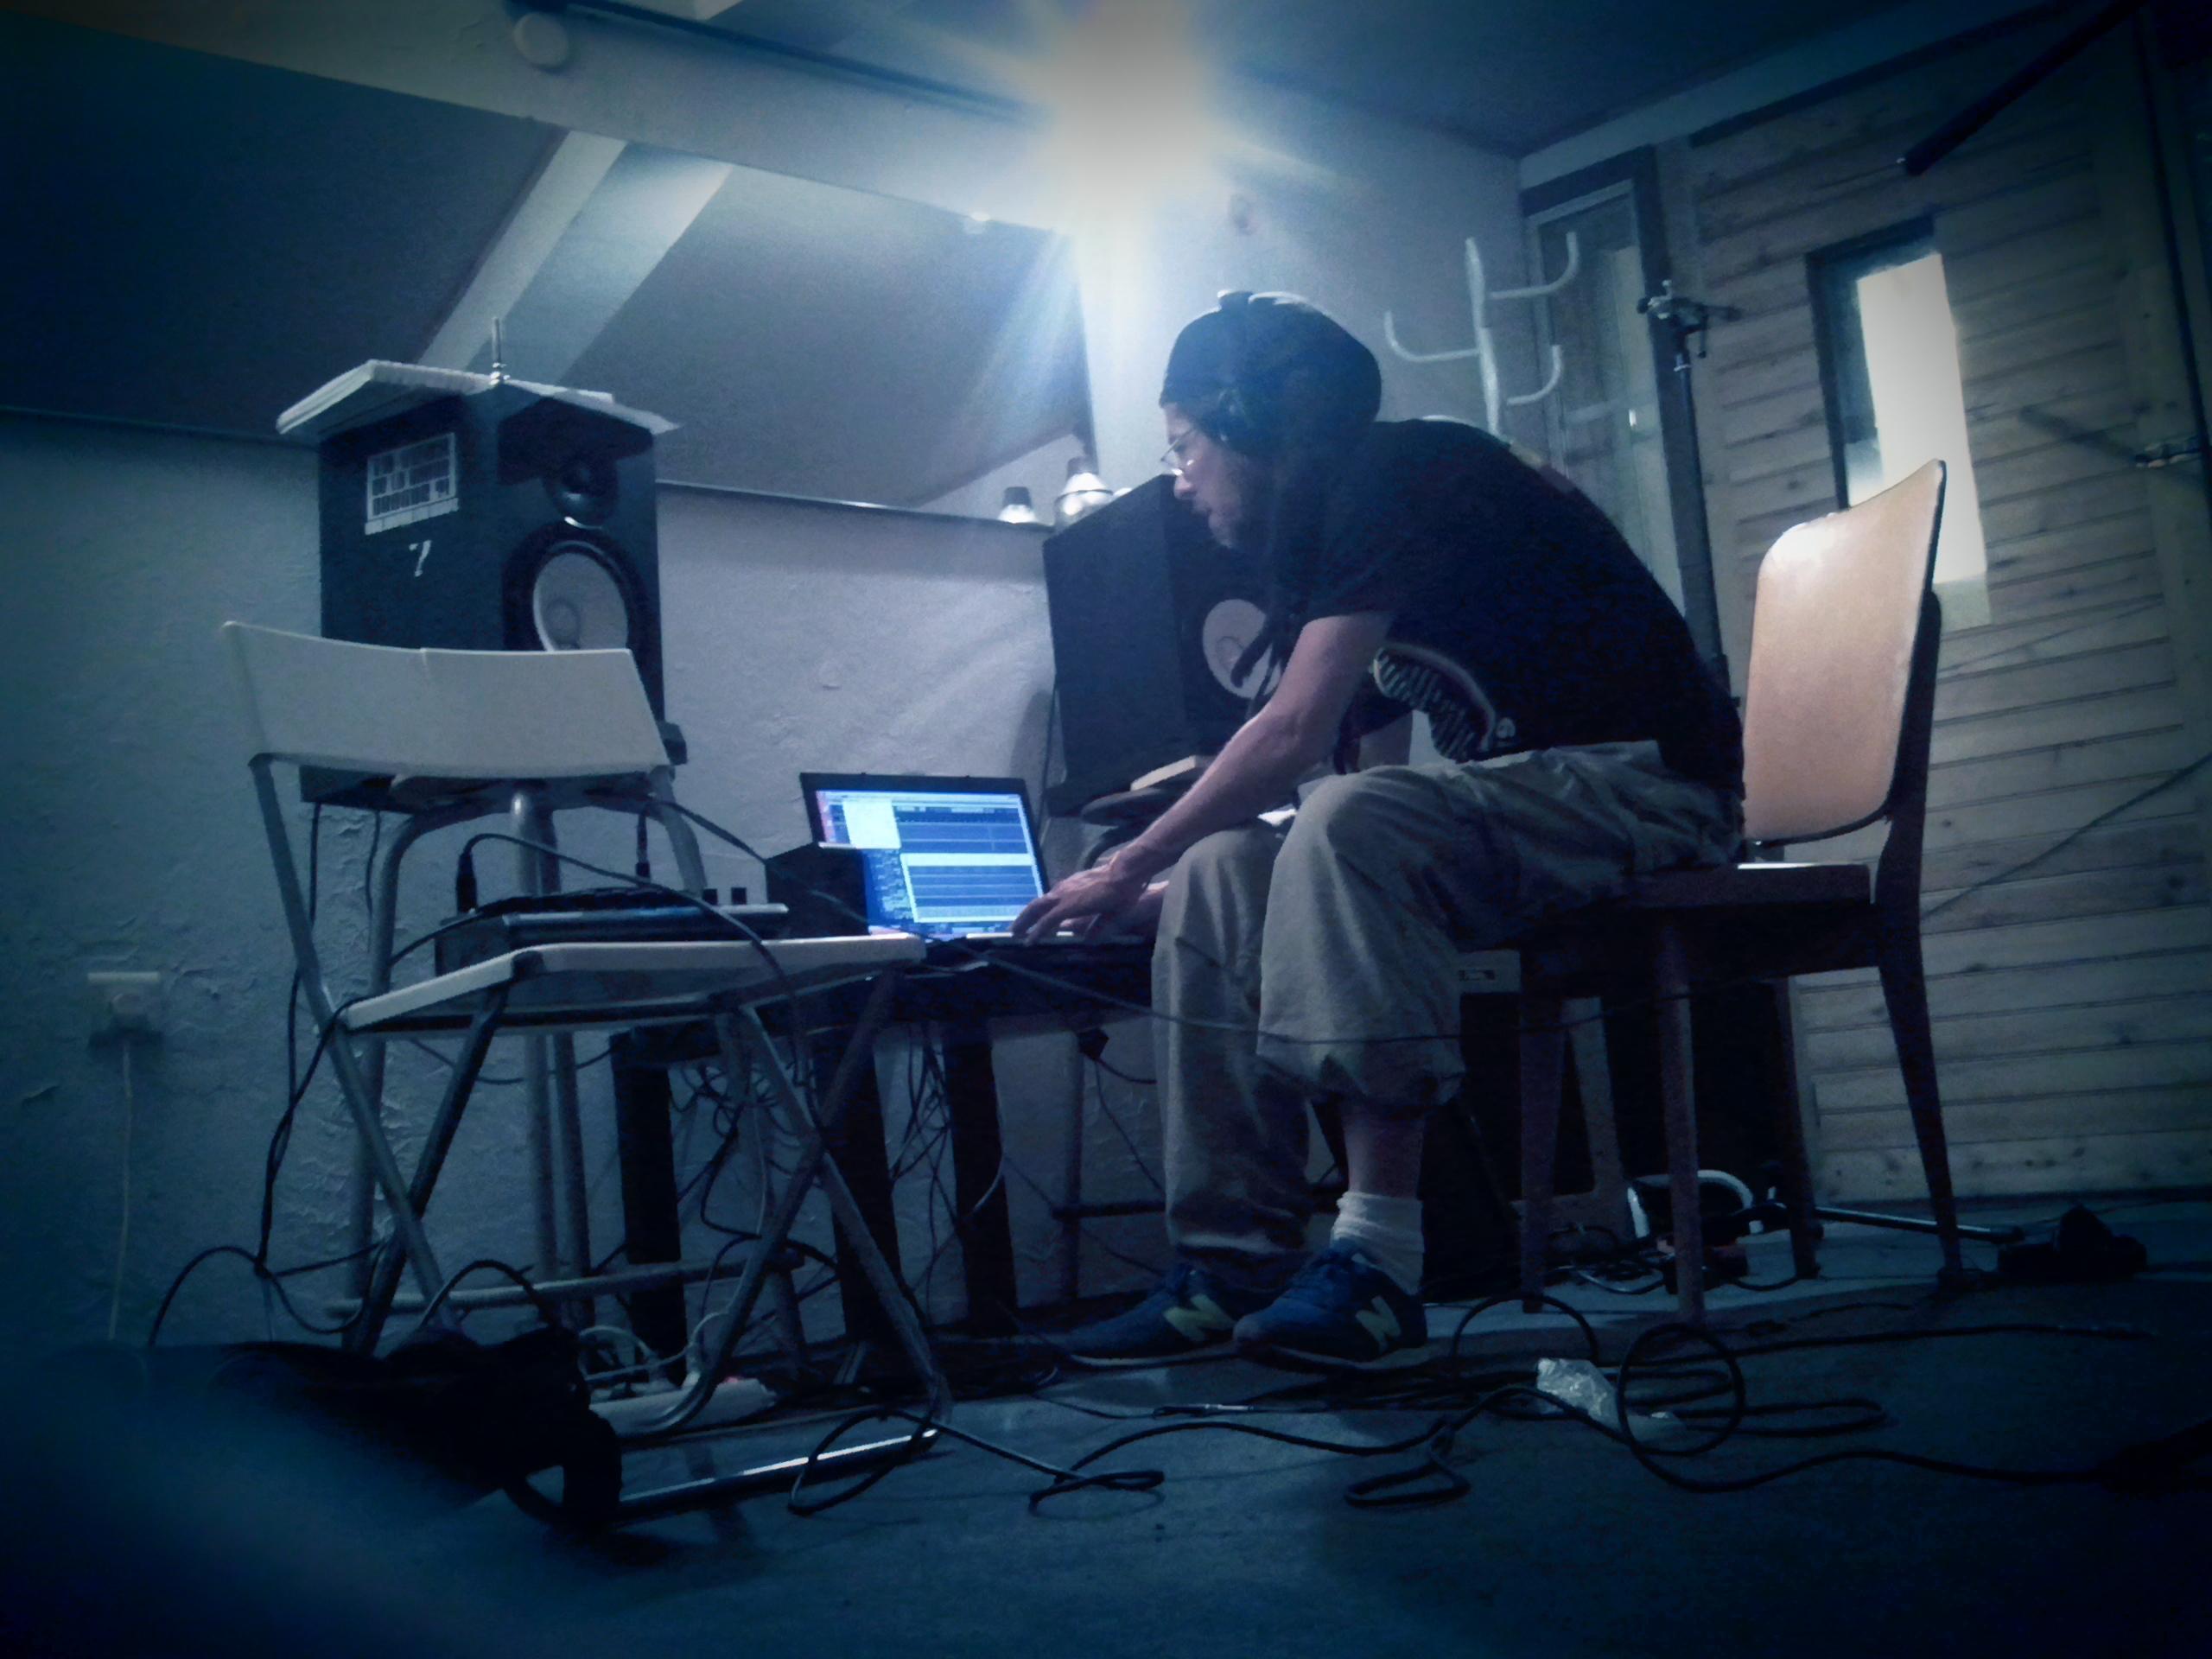 studio montreuil mai 2012 070.jpg